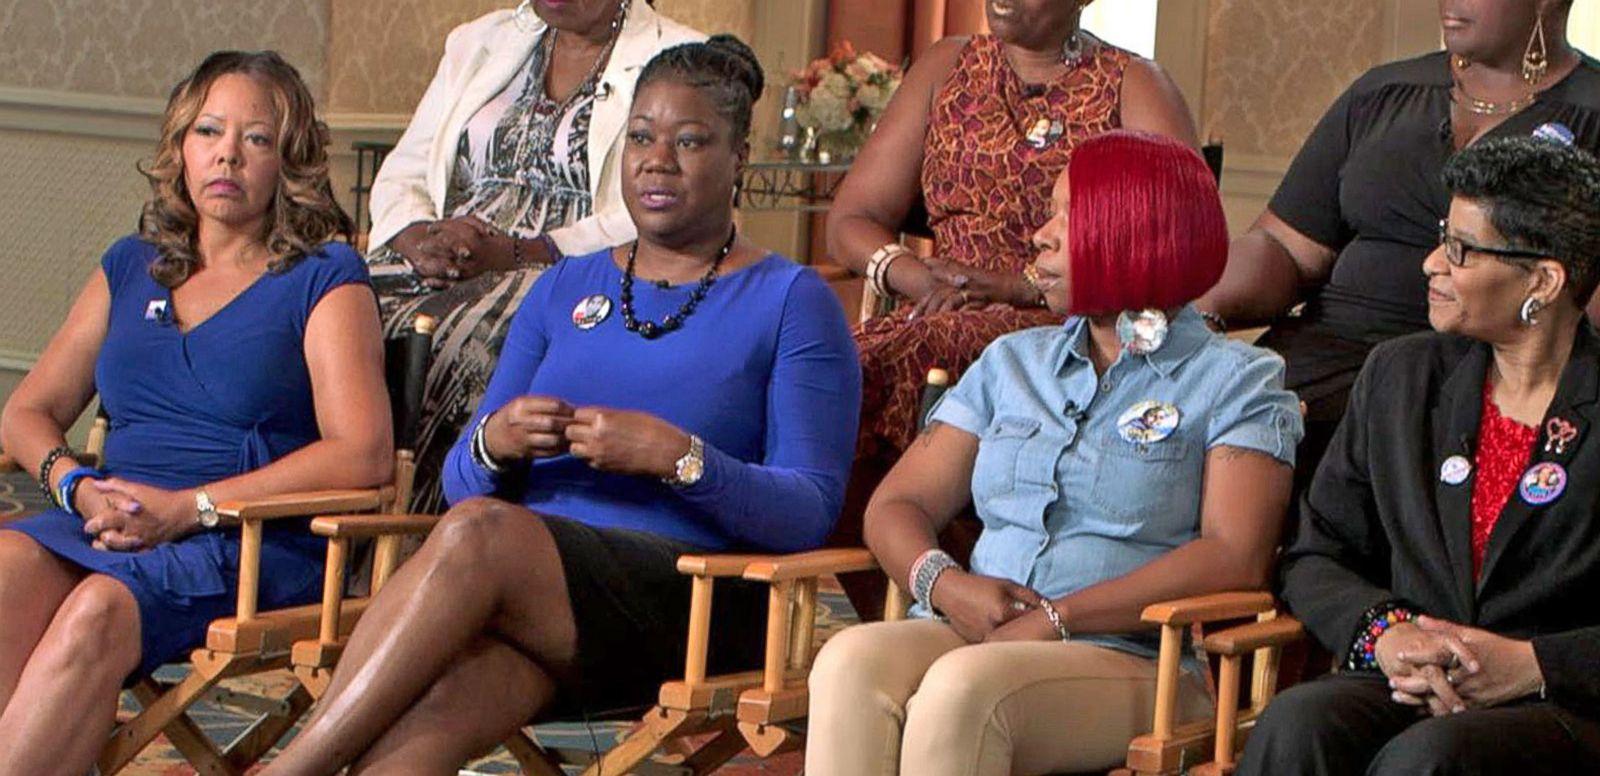 VIDEO: Women Who've Lost Children to Gun Violence Unite for Hillary Clinton